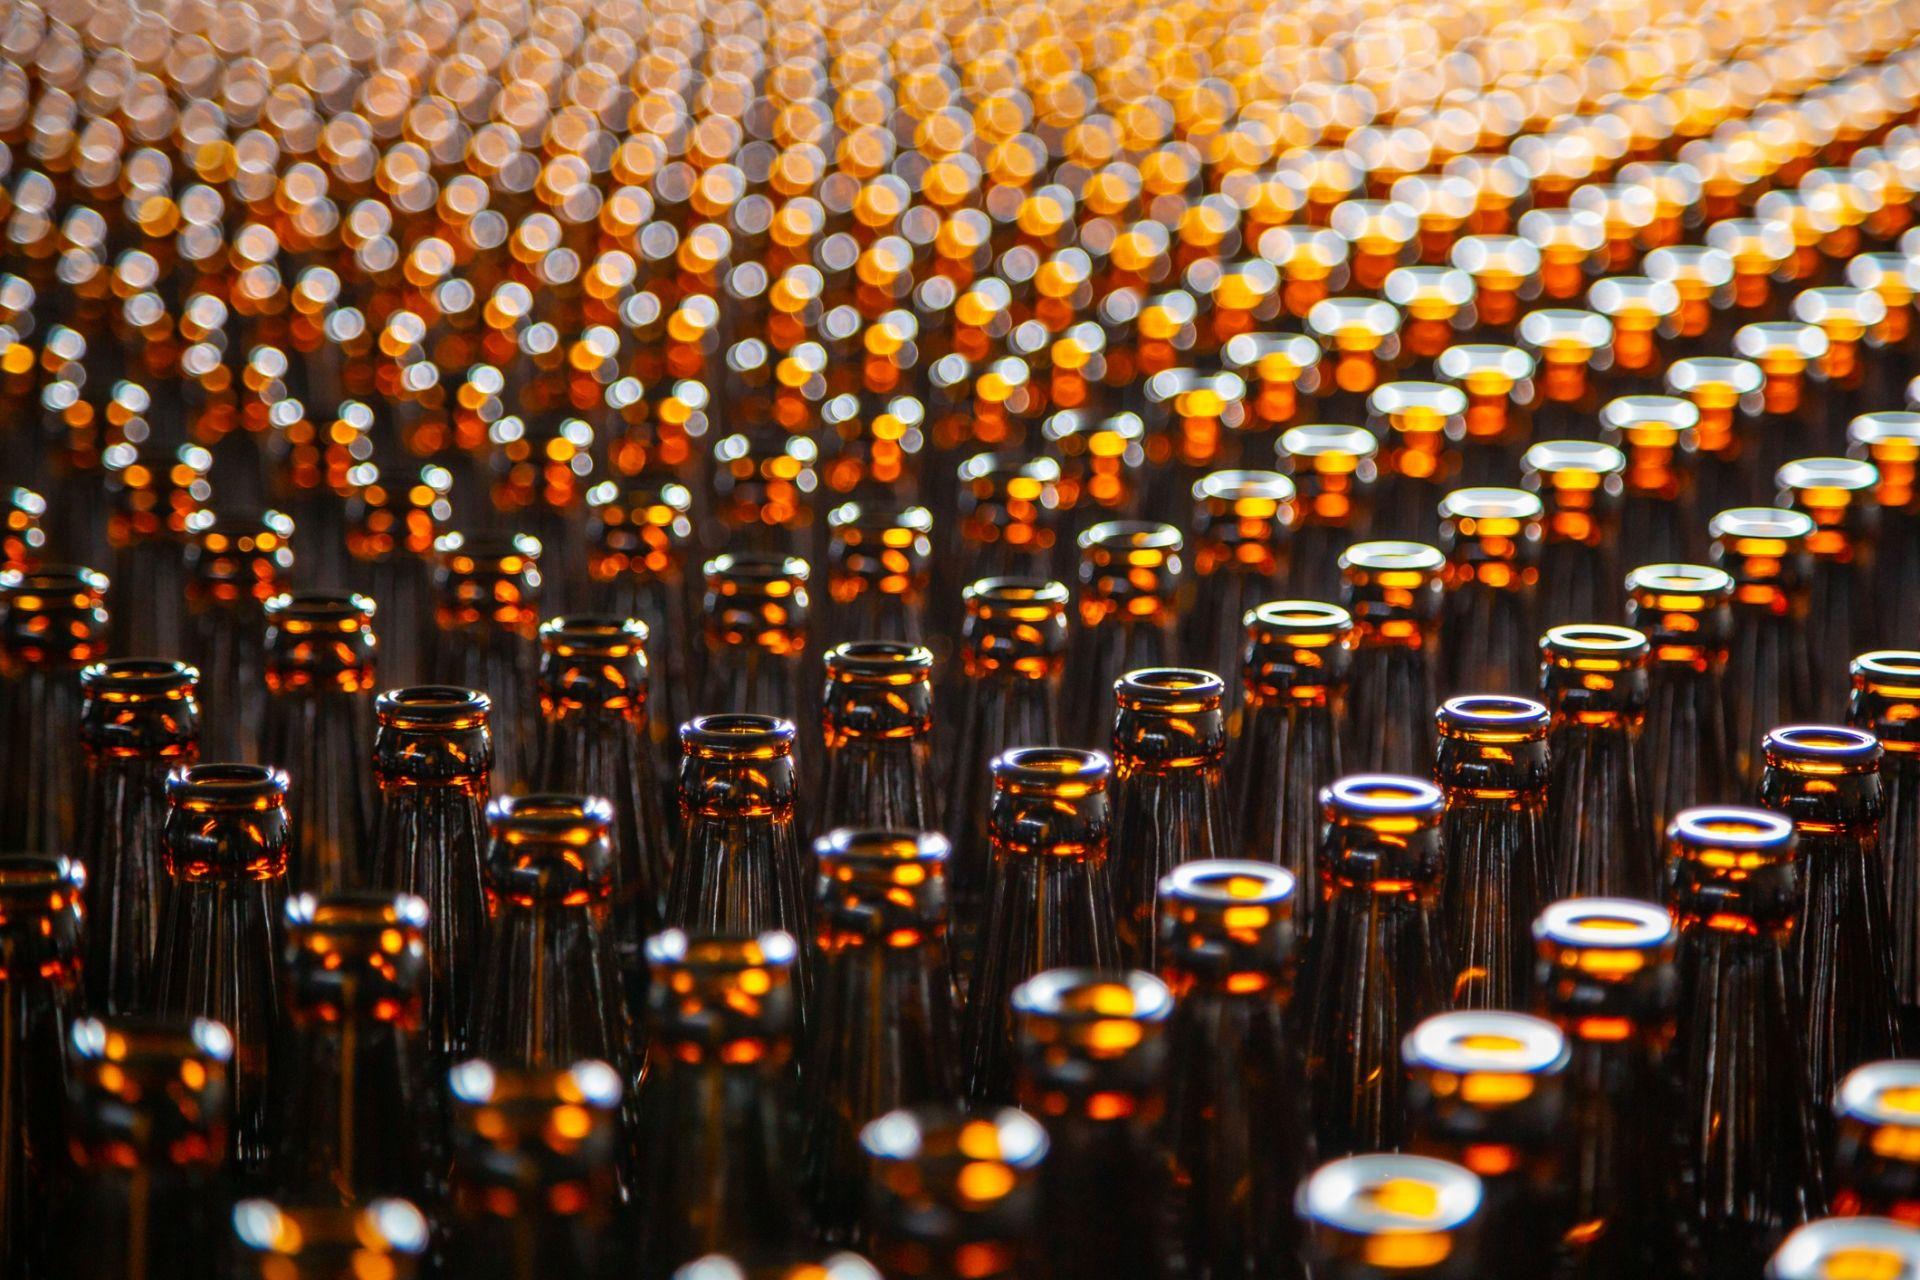 Recomendaciones para embotellar cerveza artesanal